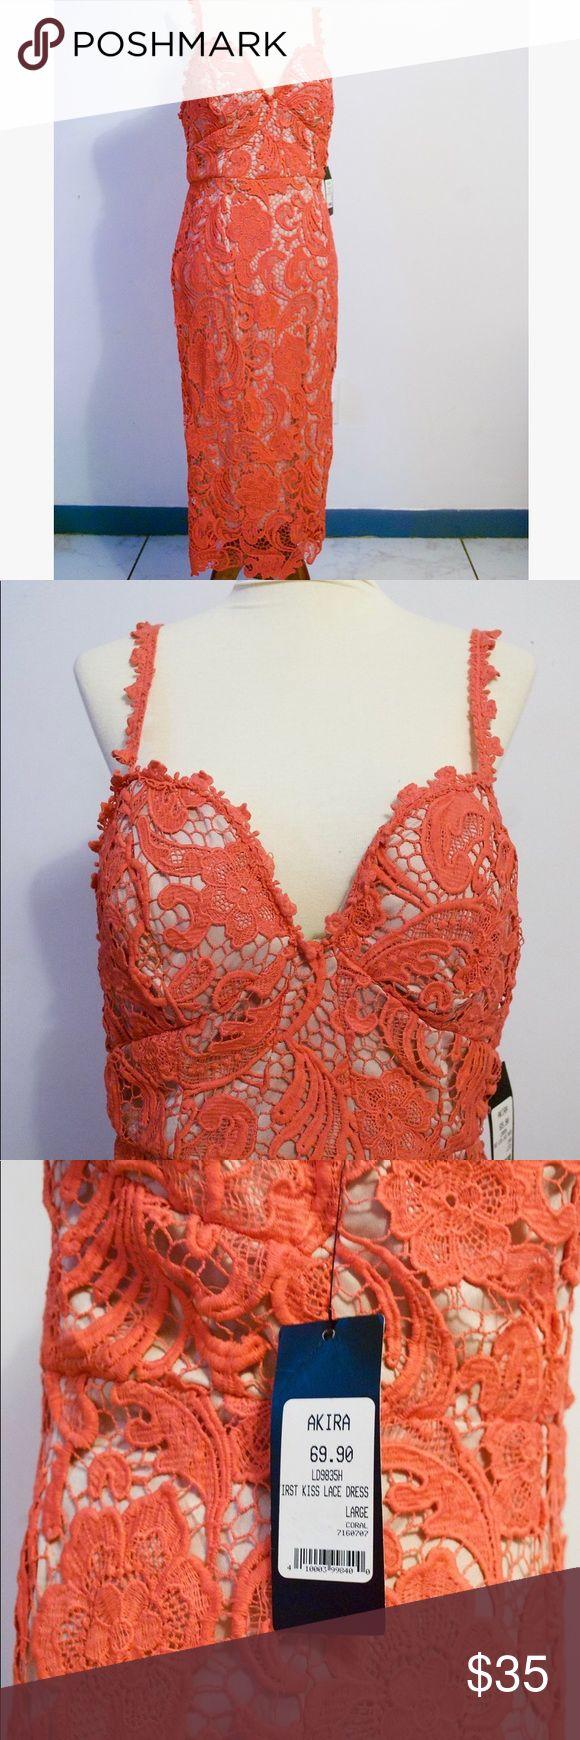 Akira Coral Lace Dress NWT! Beautiful Coral Lace Dress from Akira. Hits below the knee. Back zipper, back slit, straps, bra cups. Sweetheart neckline, 100% Polyester, Lace. AKIRA Dresses